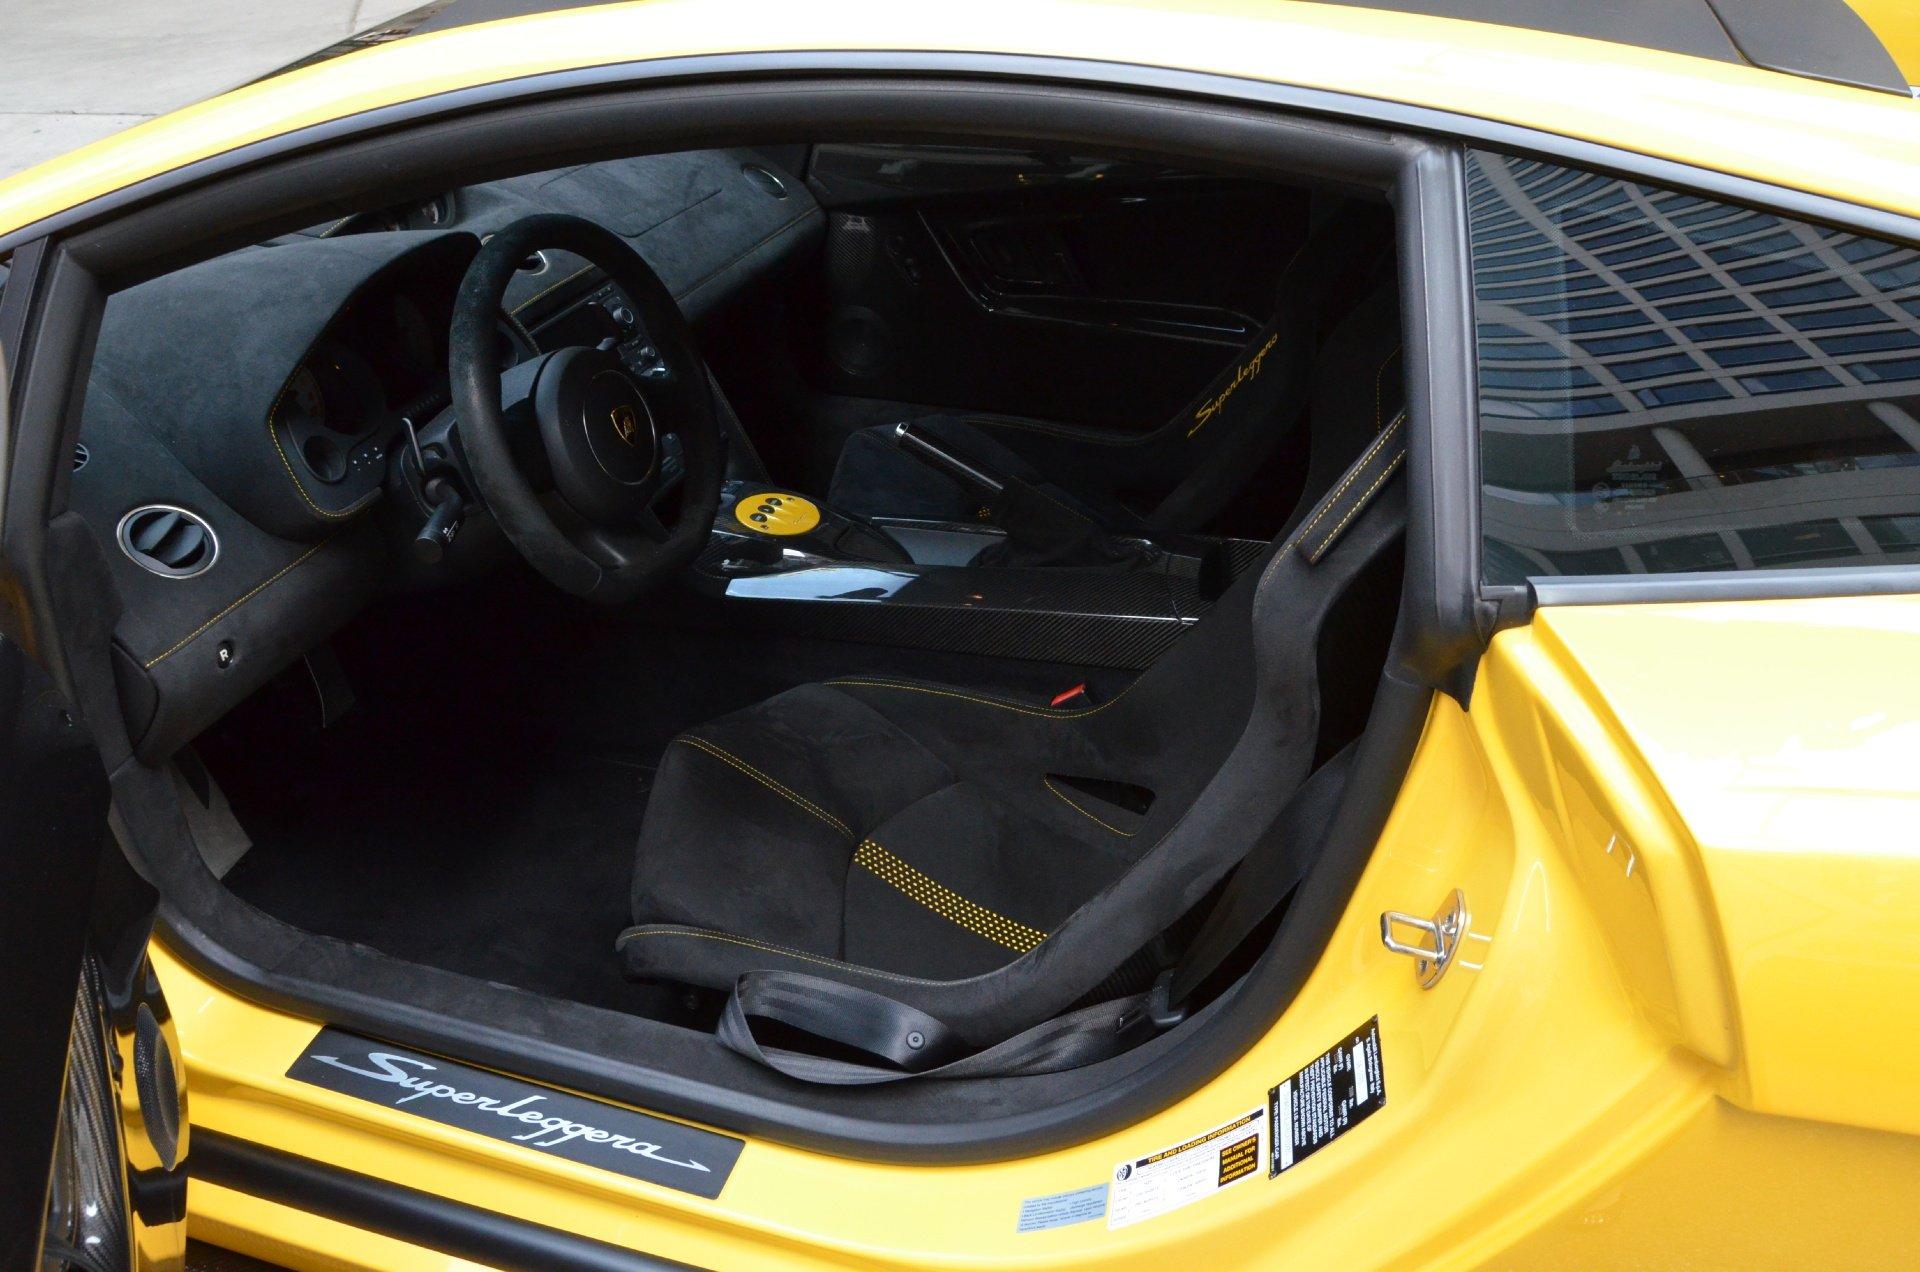 2011 Lamborghini Gallardo Lp570 4 Superleggera Cars Giallo Midas Yellow Wallpaper 1920x1272 759910 Wallpaperup